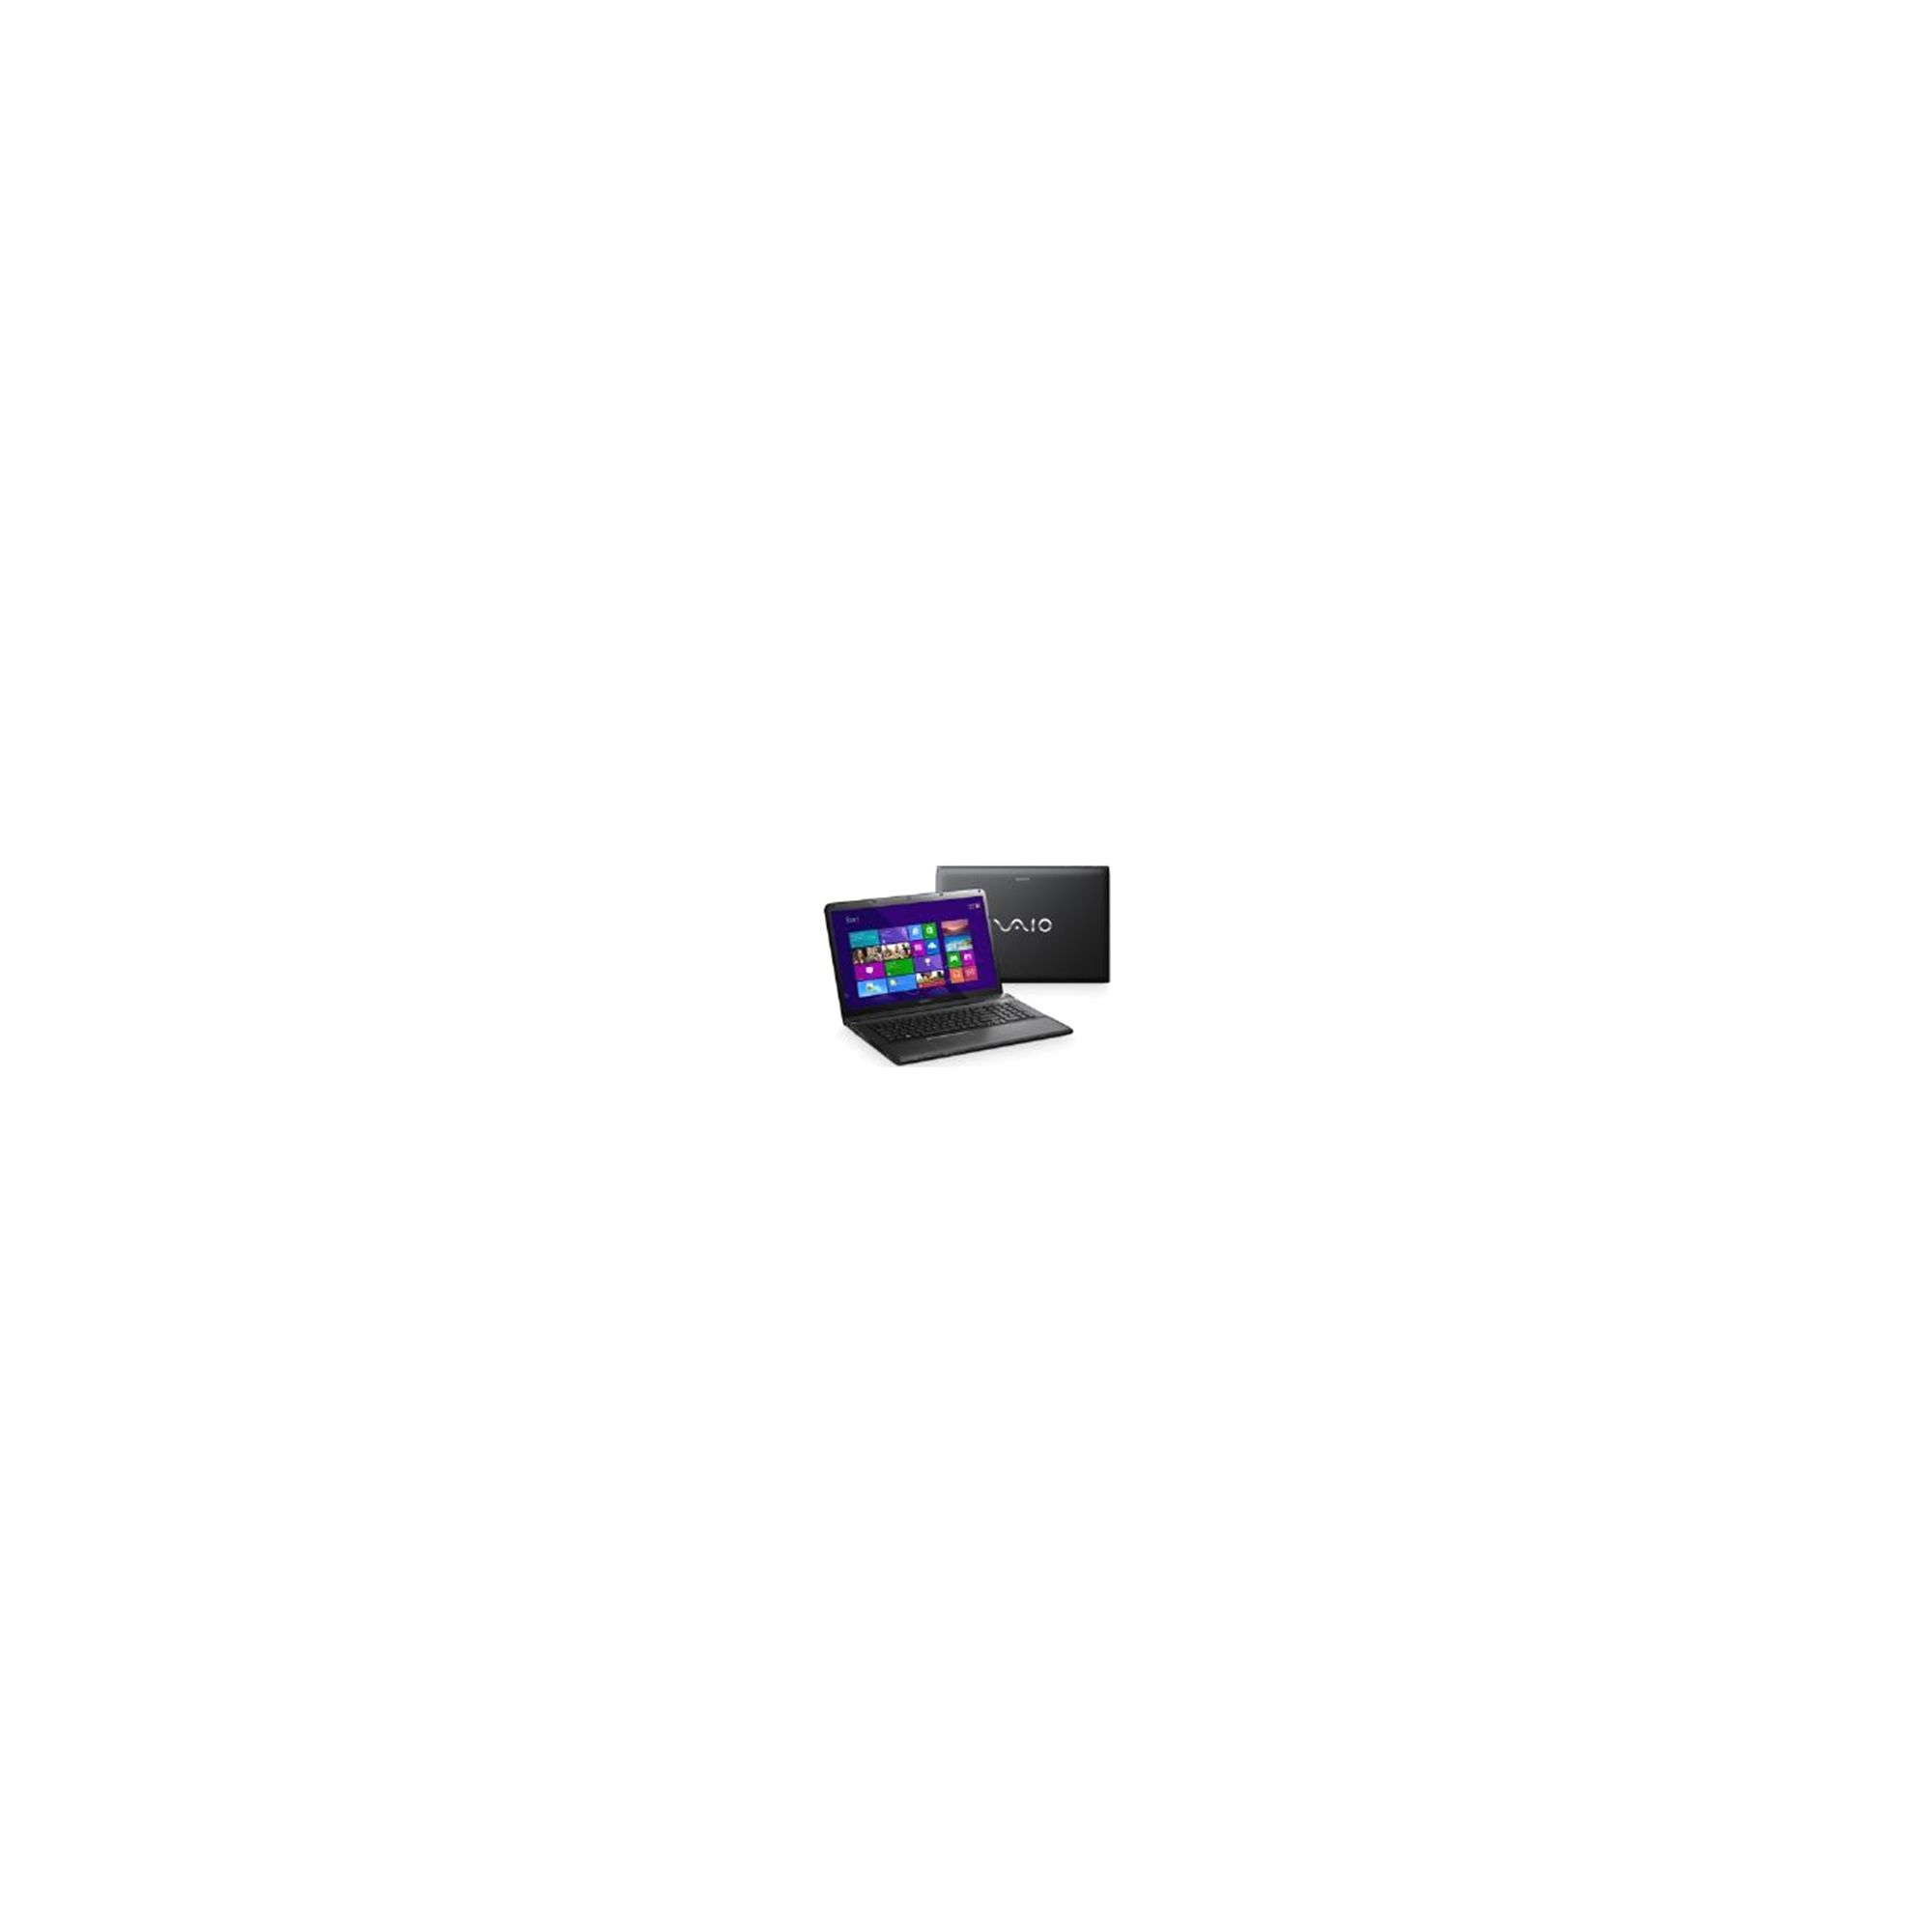 Sony Vaio SVE-1712Z1E (17.3 inch) Notebook i7 (3632QM) 2.20GHz 8GB 1TB DVD±RW WLAN BT Windows 8 (Radeon HD 7650M) (Black) at Tescos Direct